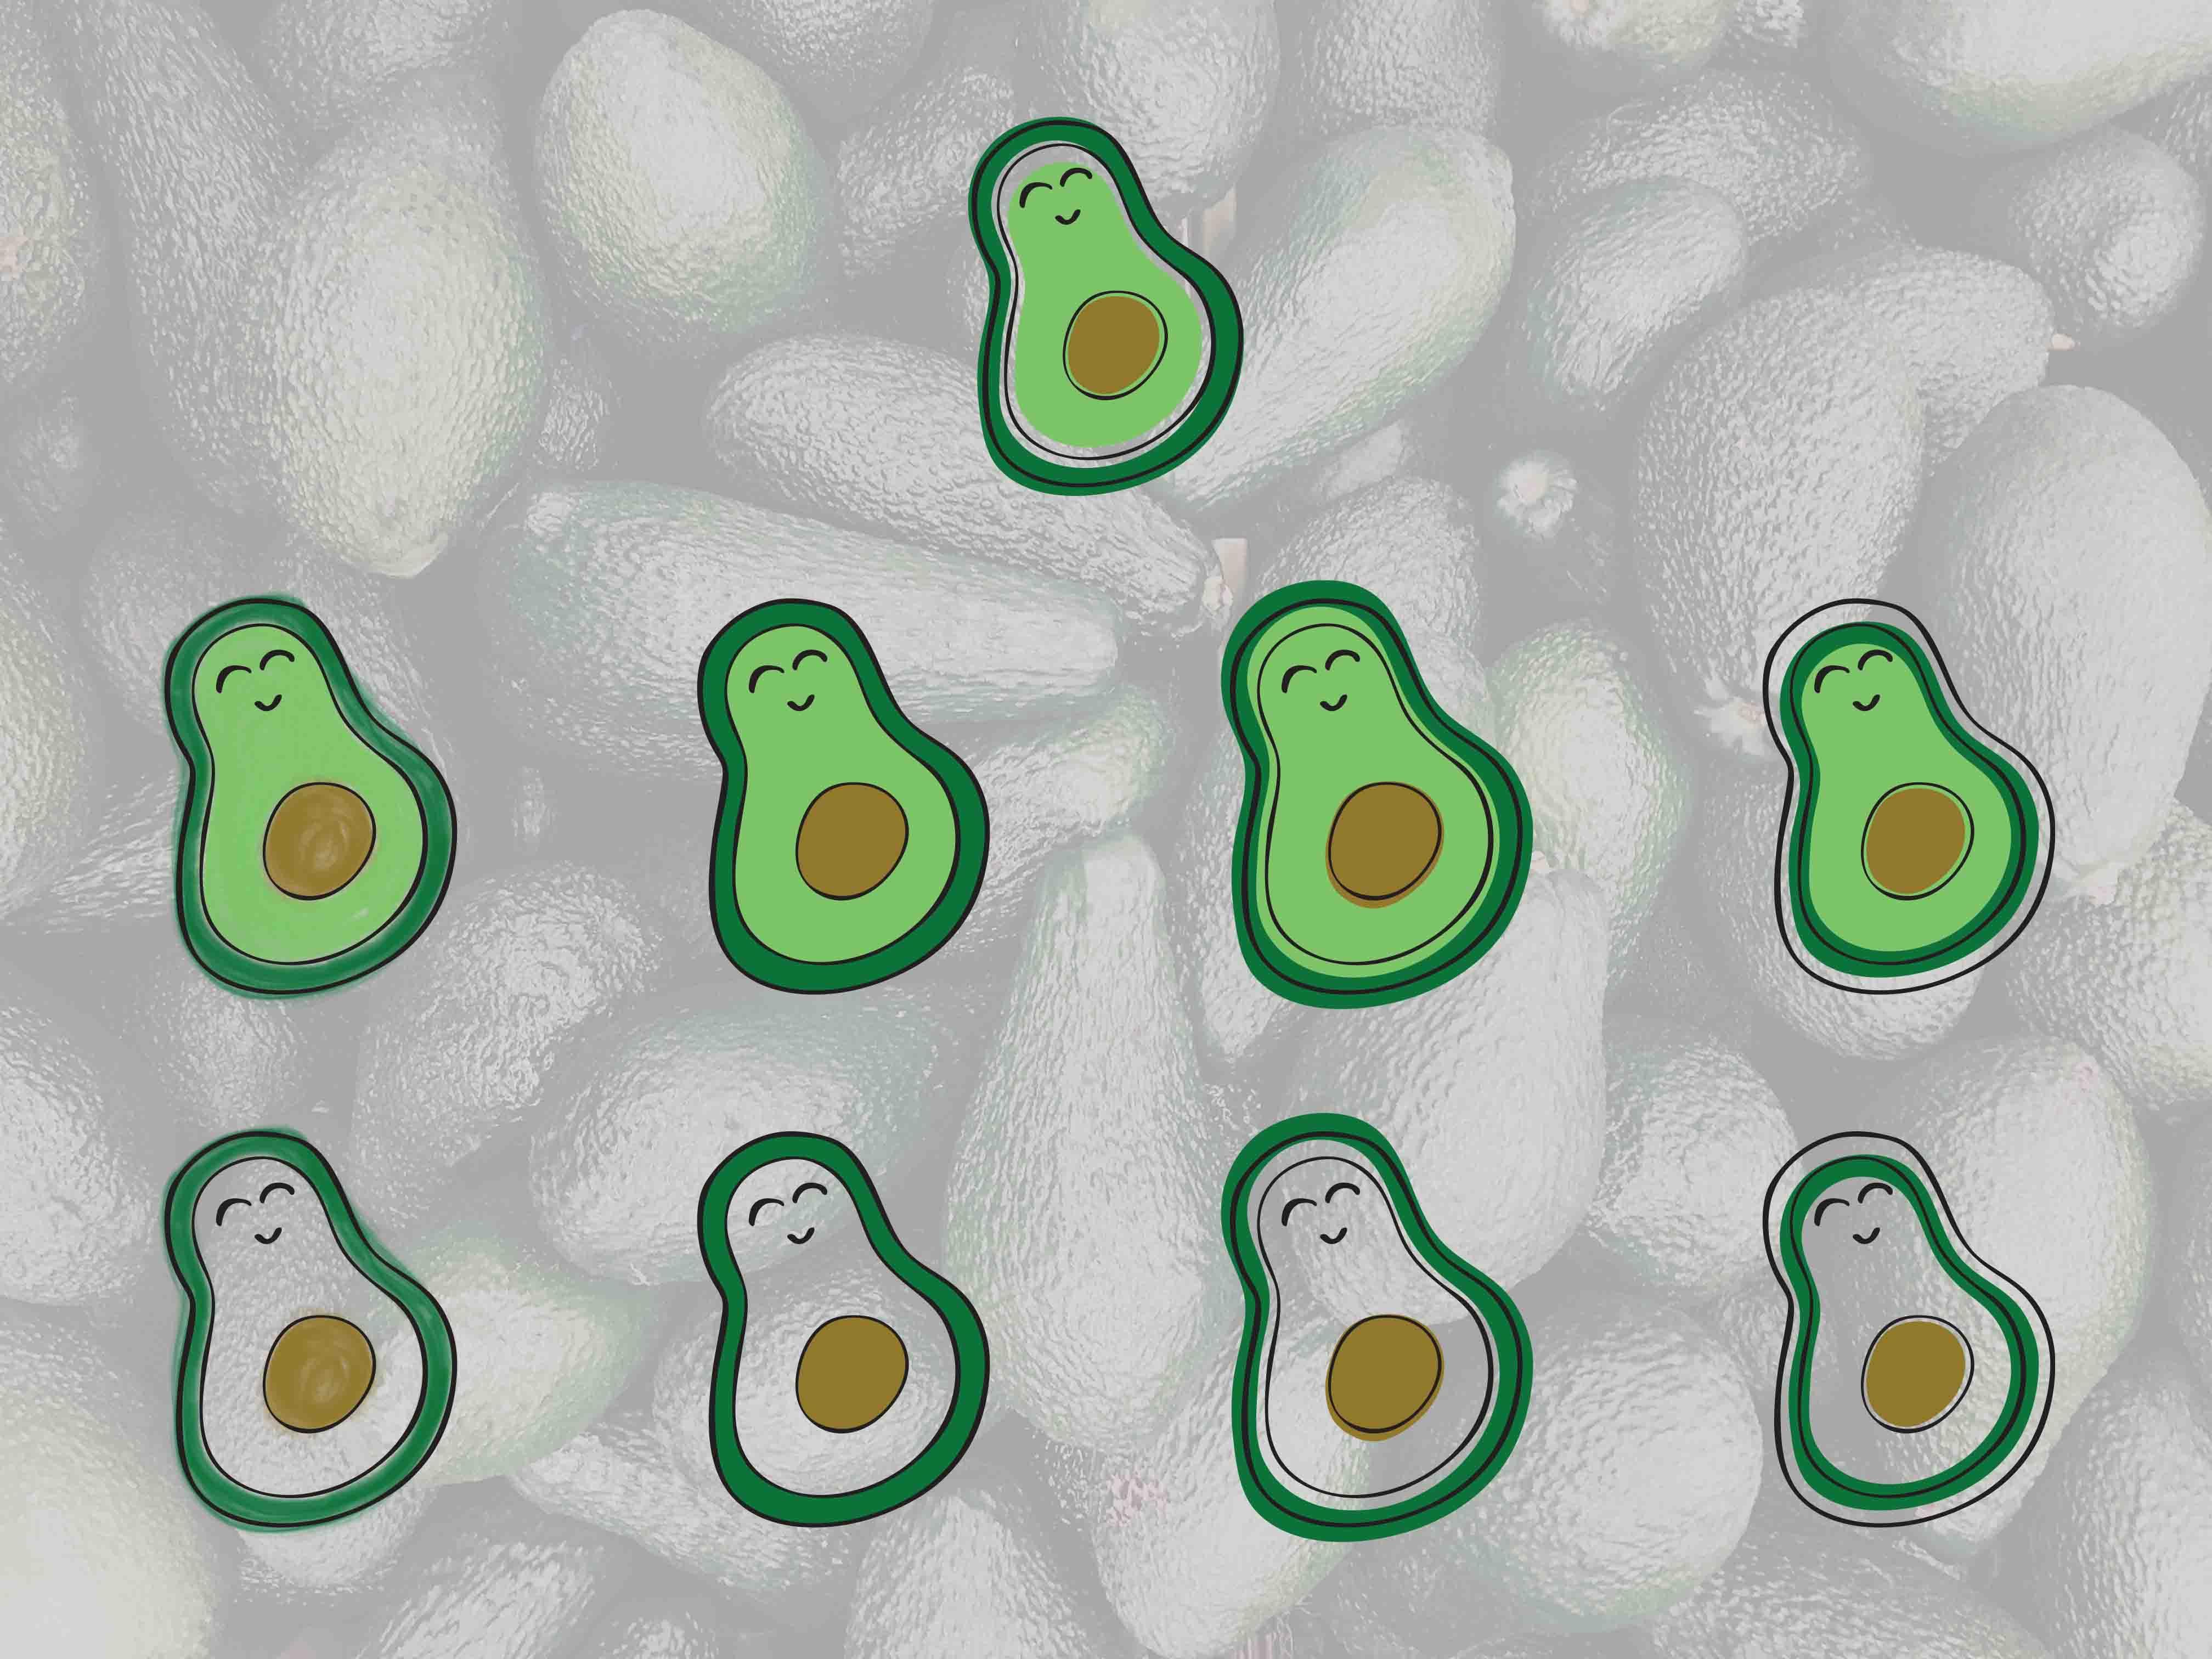 Multiple avocado